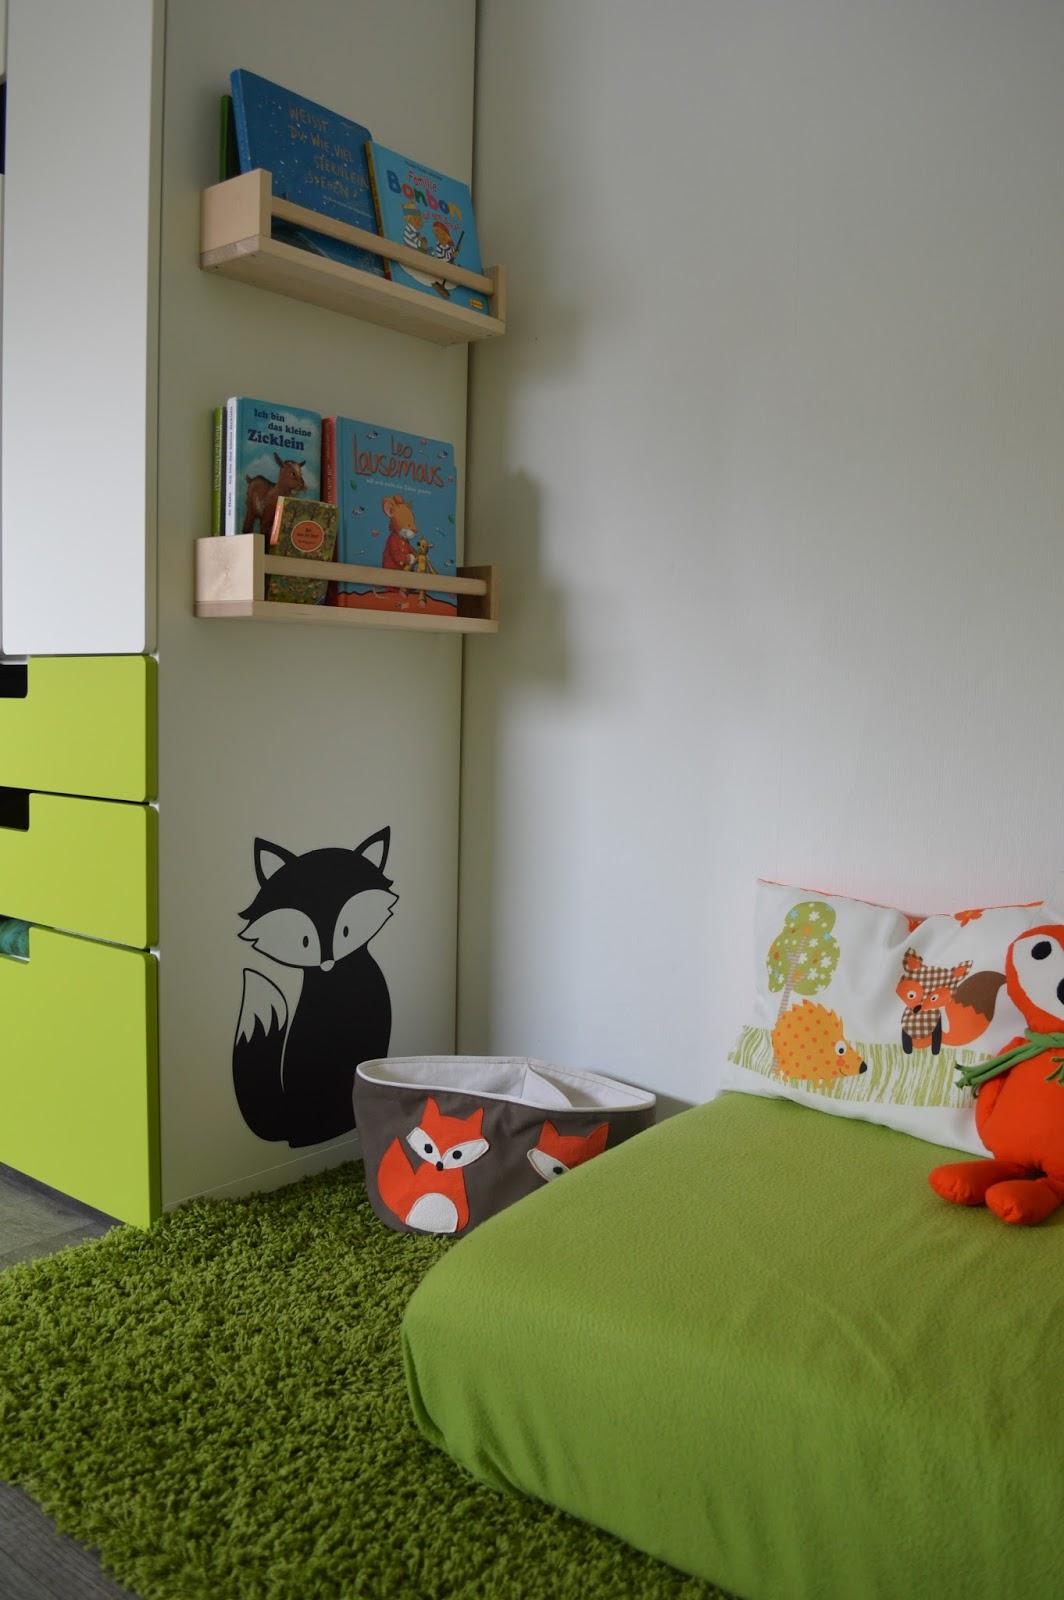 ideenwiese kinderzimmer teil 2. Black Bedroom Furniture Sets. Home Design Ideas